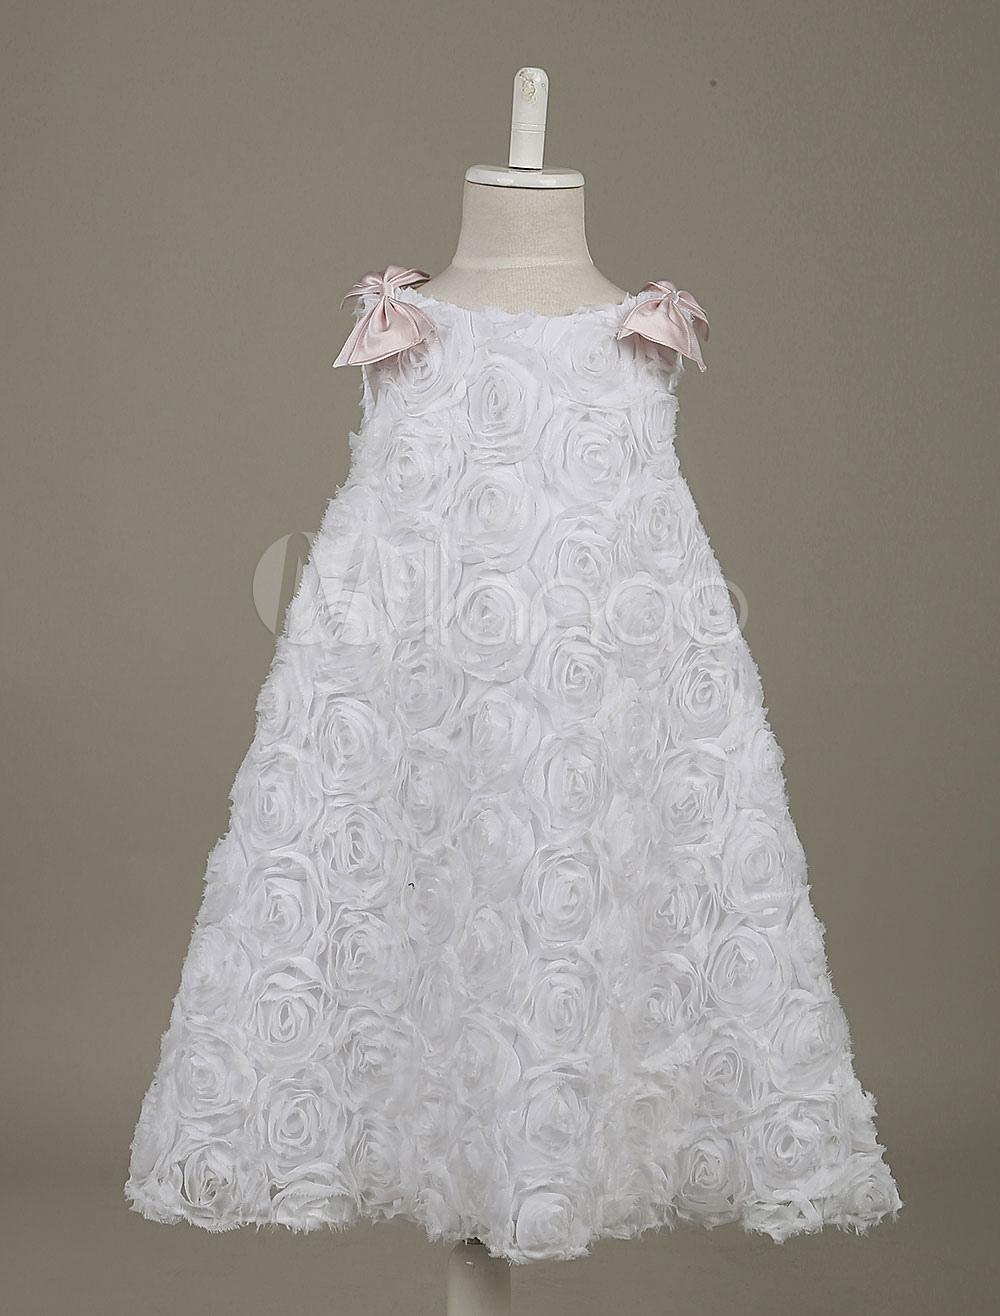 Flower Girl Dresses White Lace Boho Sleeveless Bow Deco